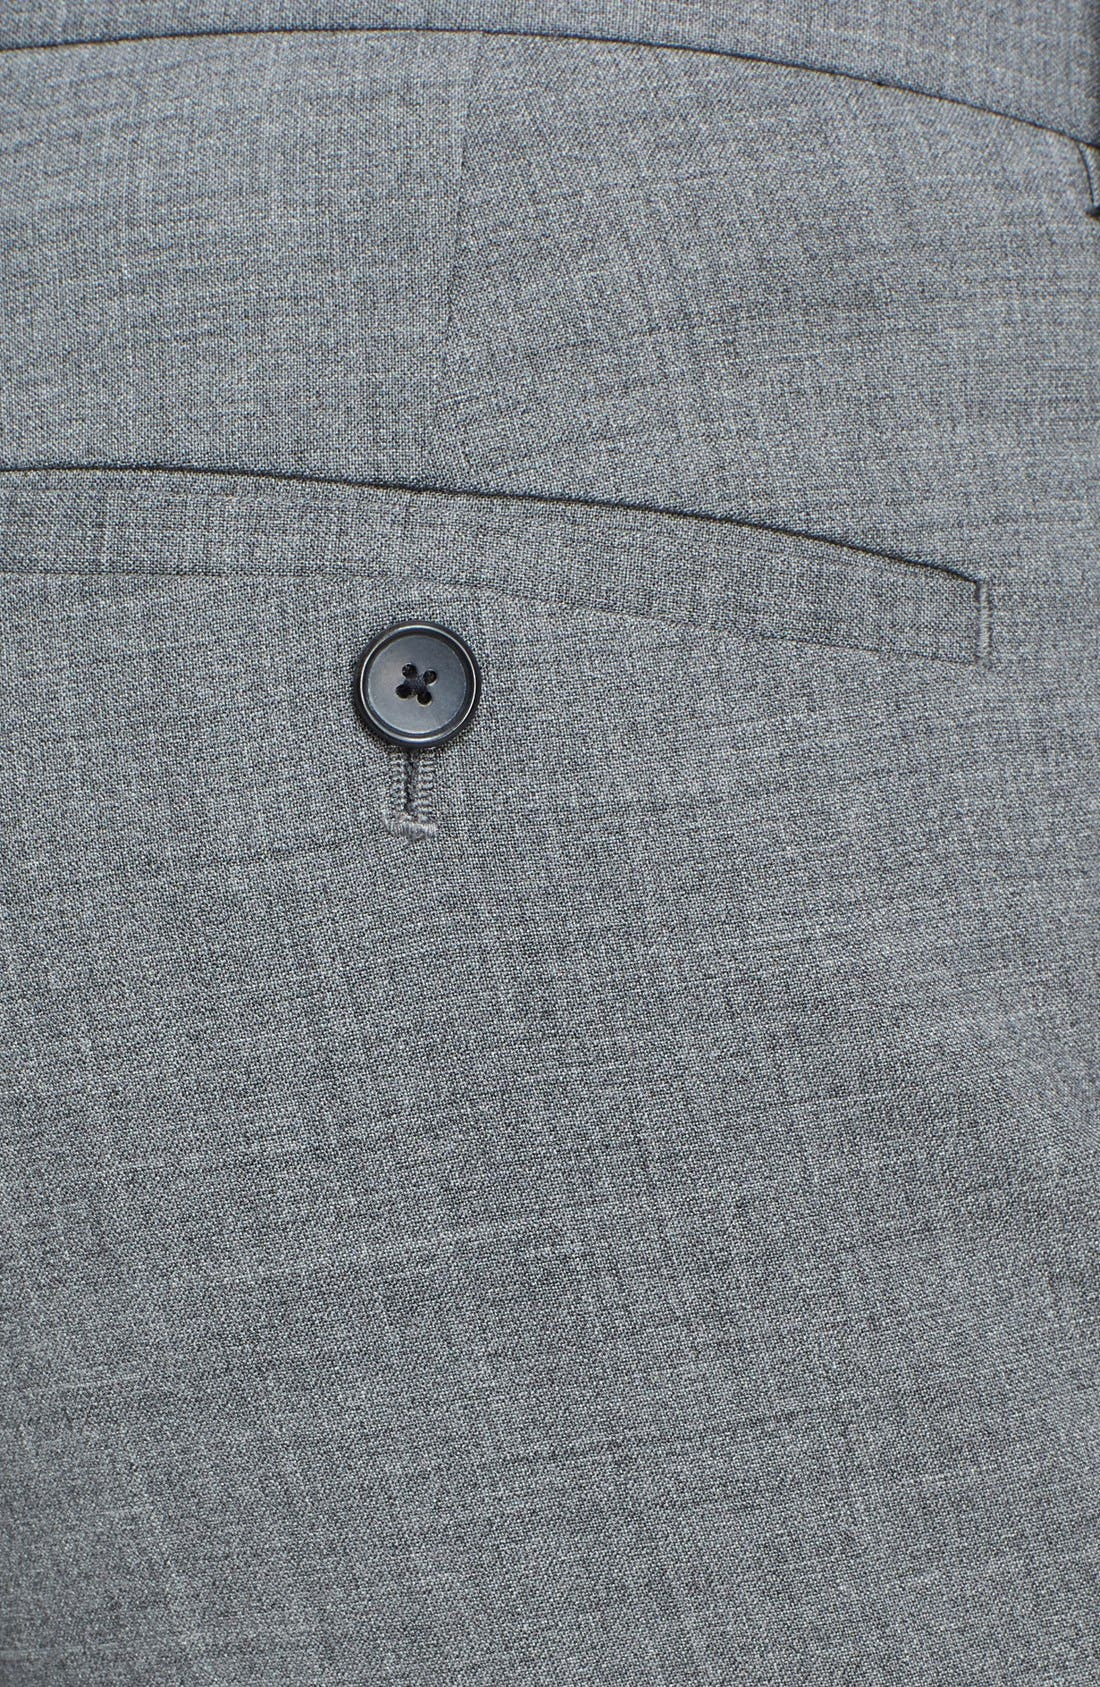 'Marlo New Tailor' Slim Fit Pants,                             Alternate thumbnail 7, color,